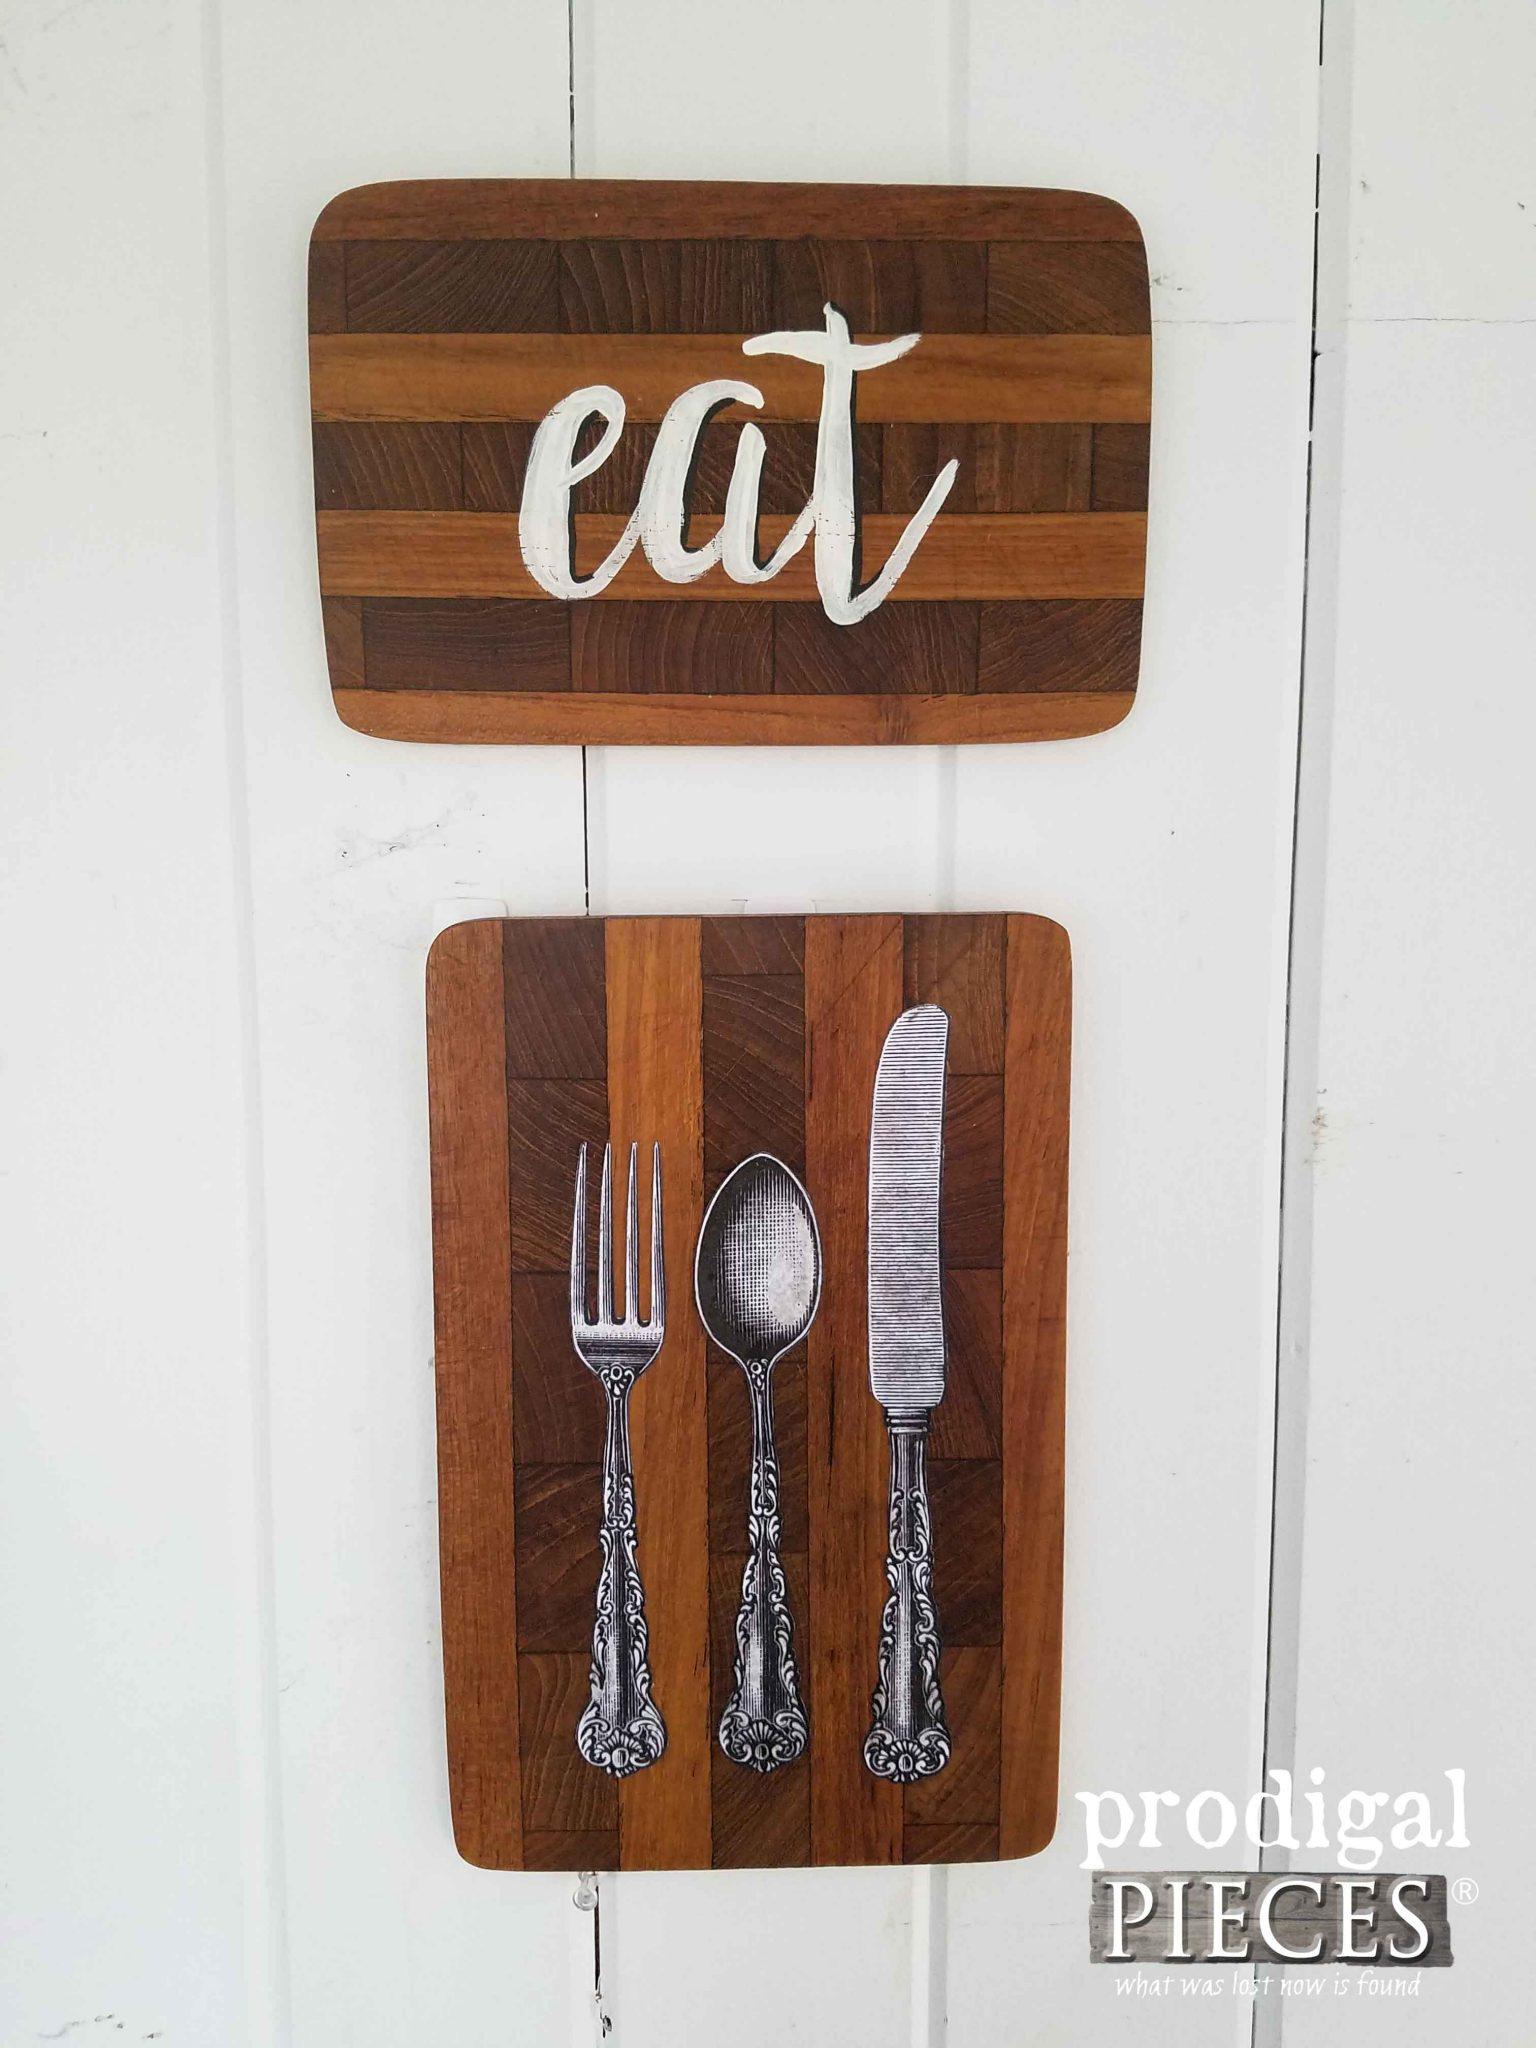 Cutting Board Kitchen Art by Prodigal Pieces | prodigalpieces.com